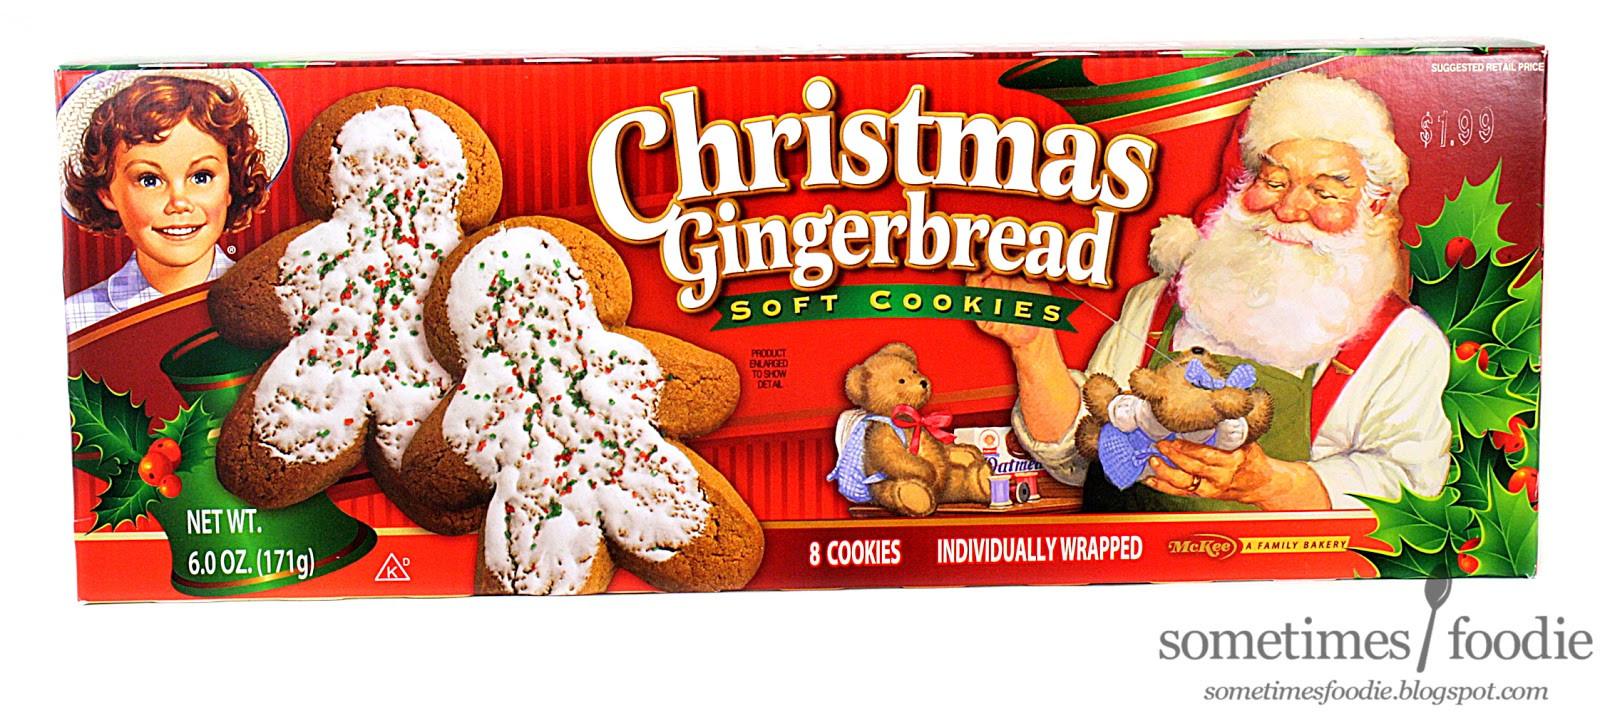 Christmas Cookies Walmart  Sometimes Foo Christmas Gingerbread Soft Cookies Walmart